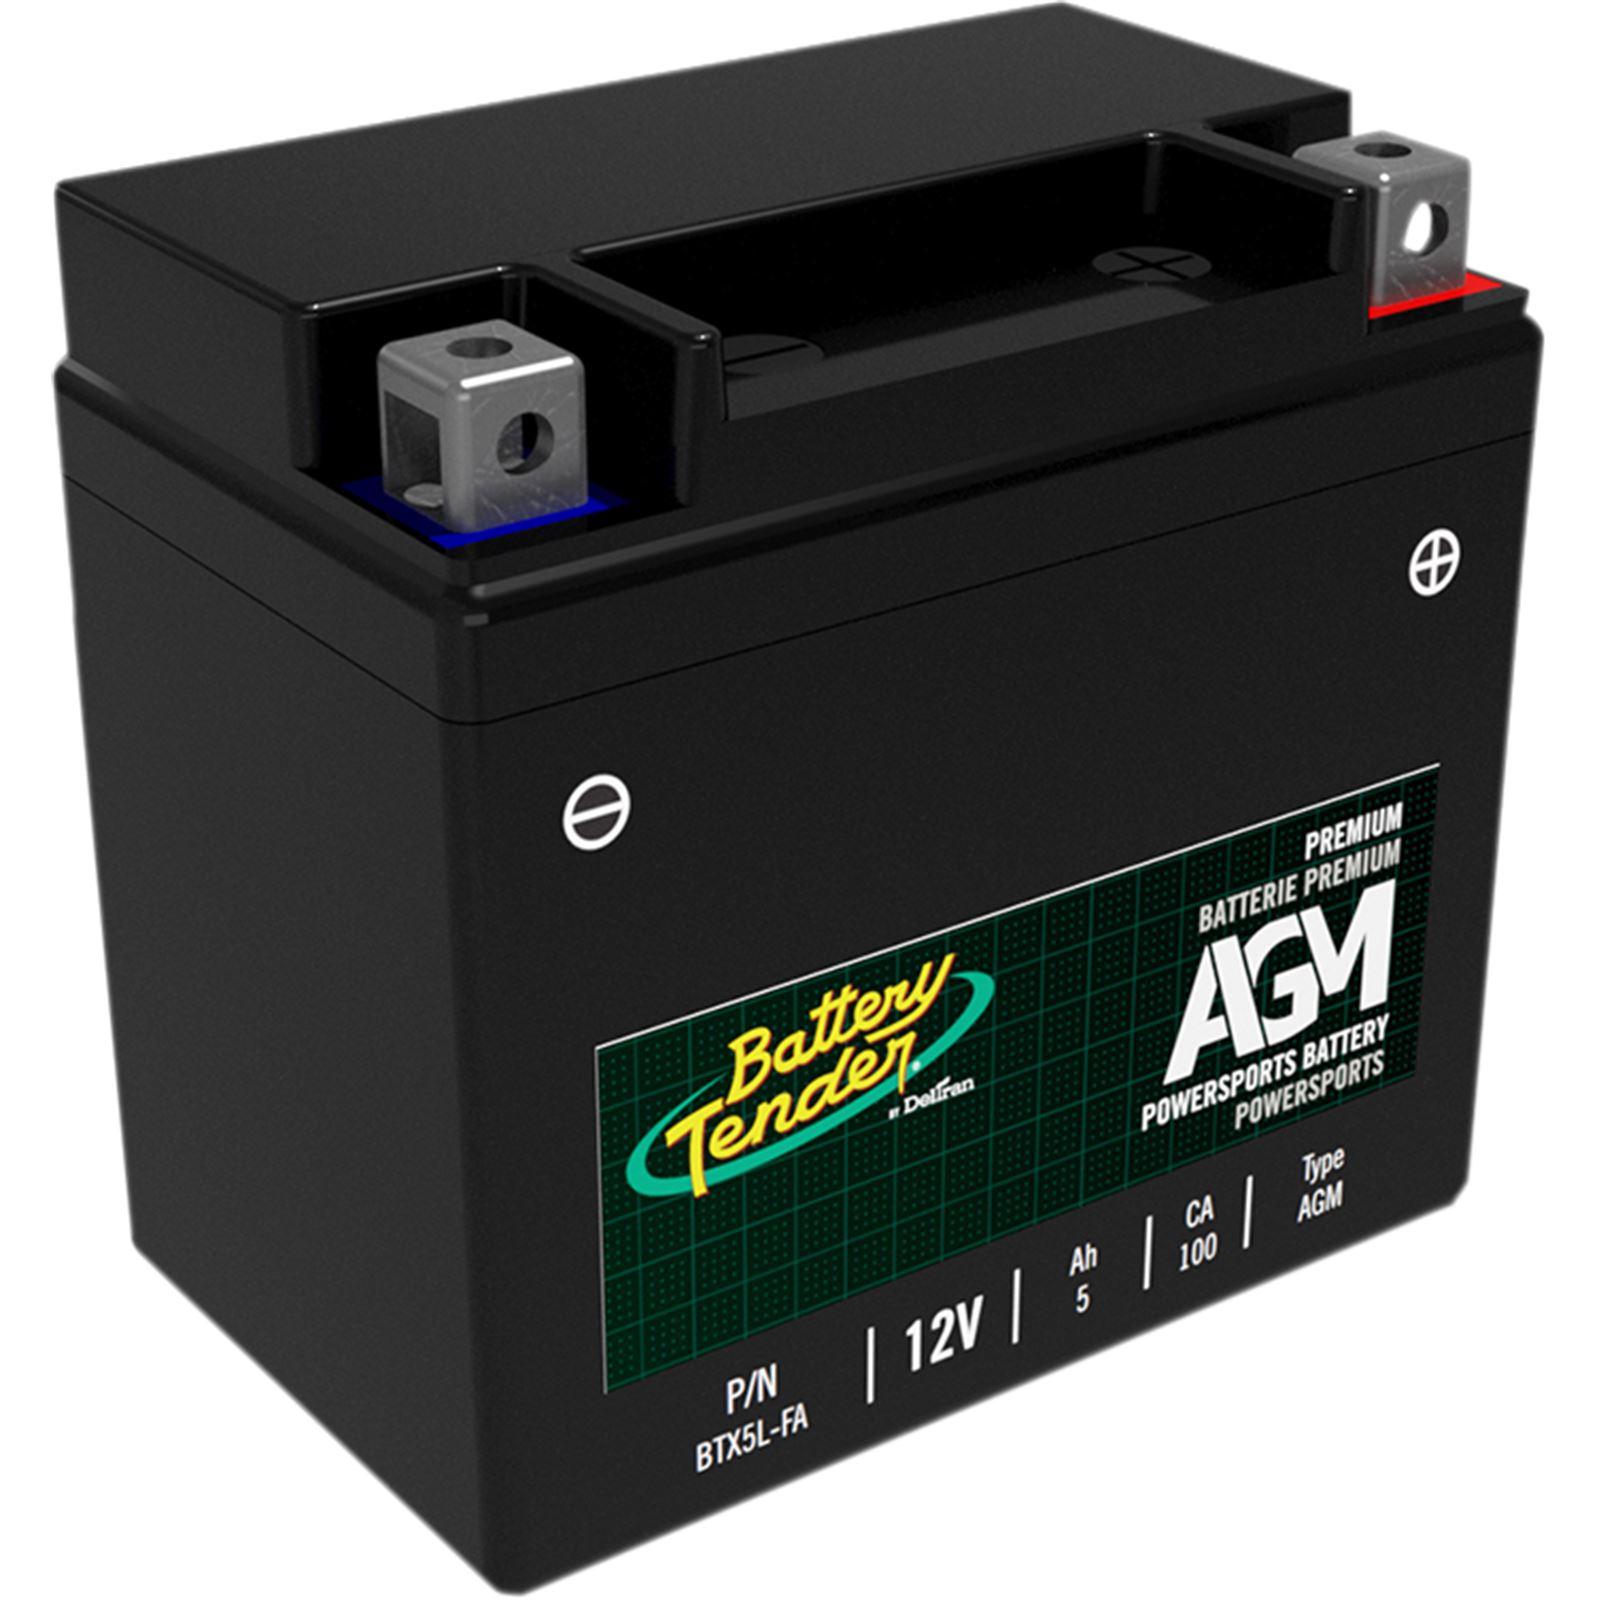 Battery Tender AGM Battery - BTX5L-FA